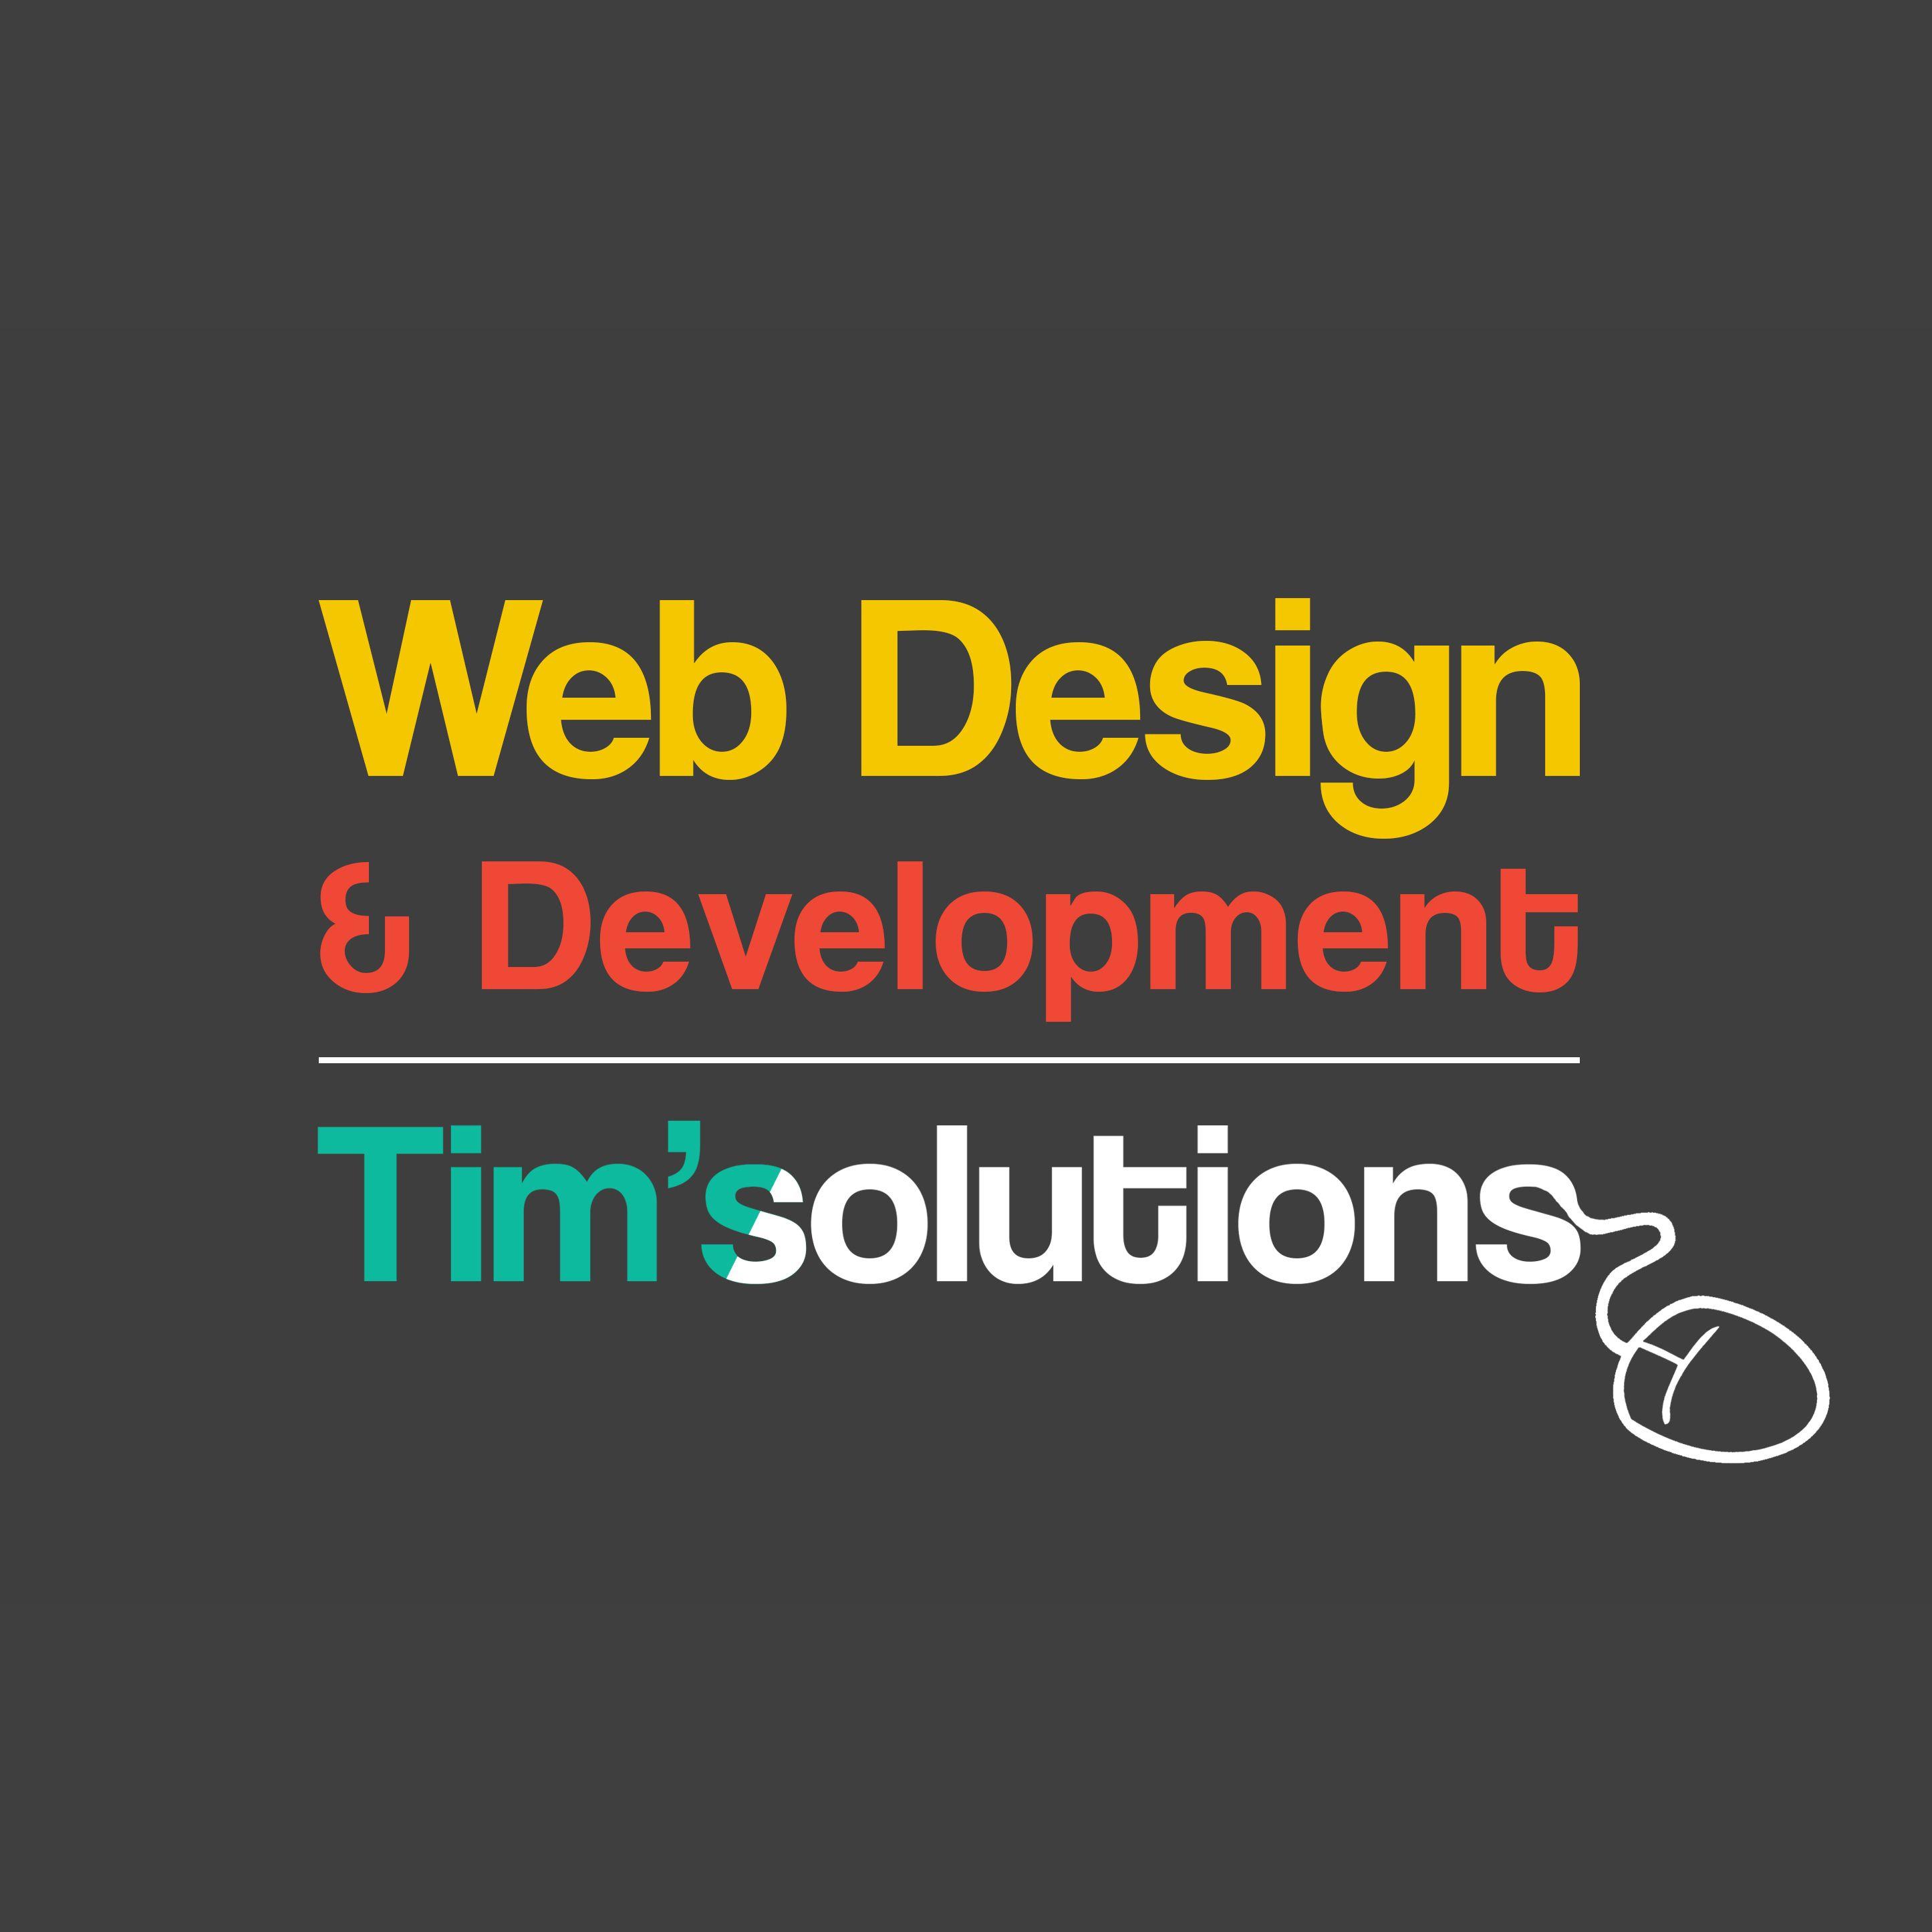 Freelance Web Design Development Online Marketing Learn Web Design Freelance Web Design Web Design